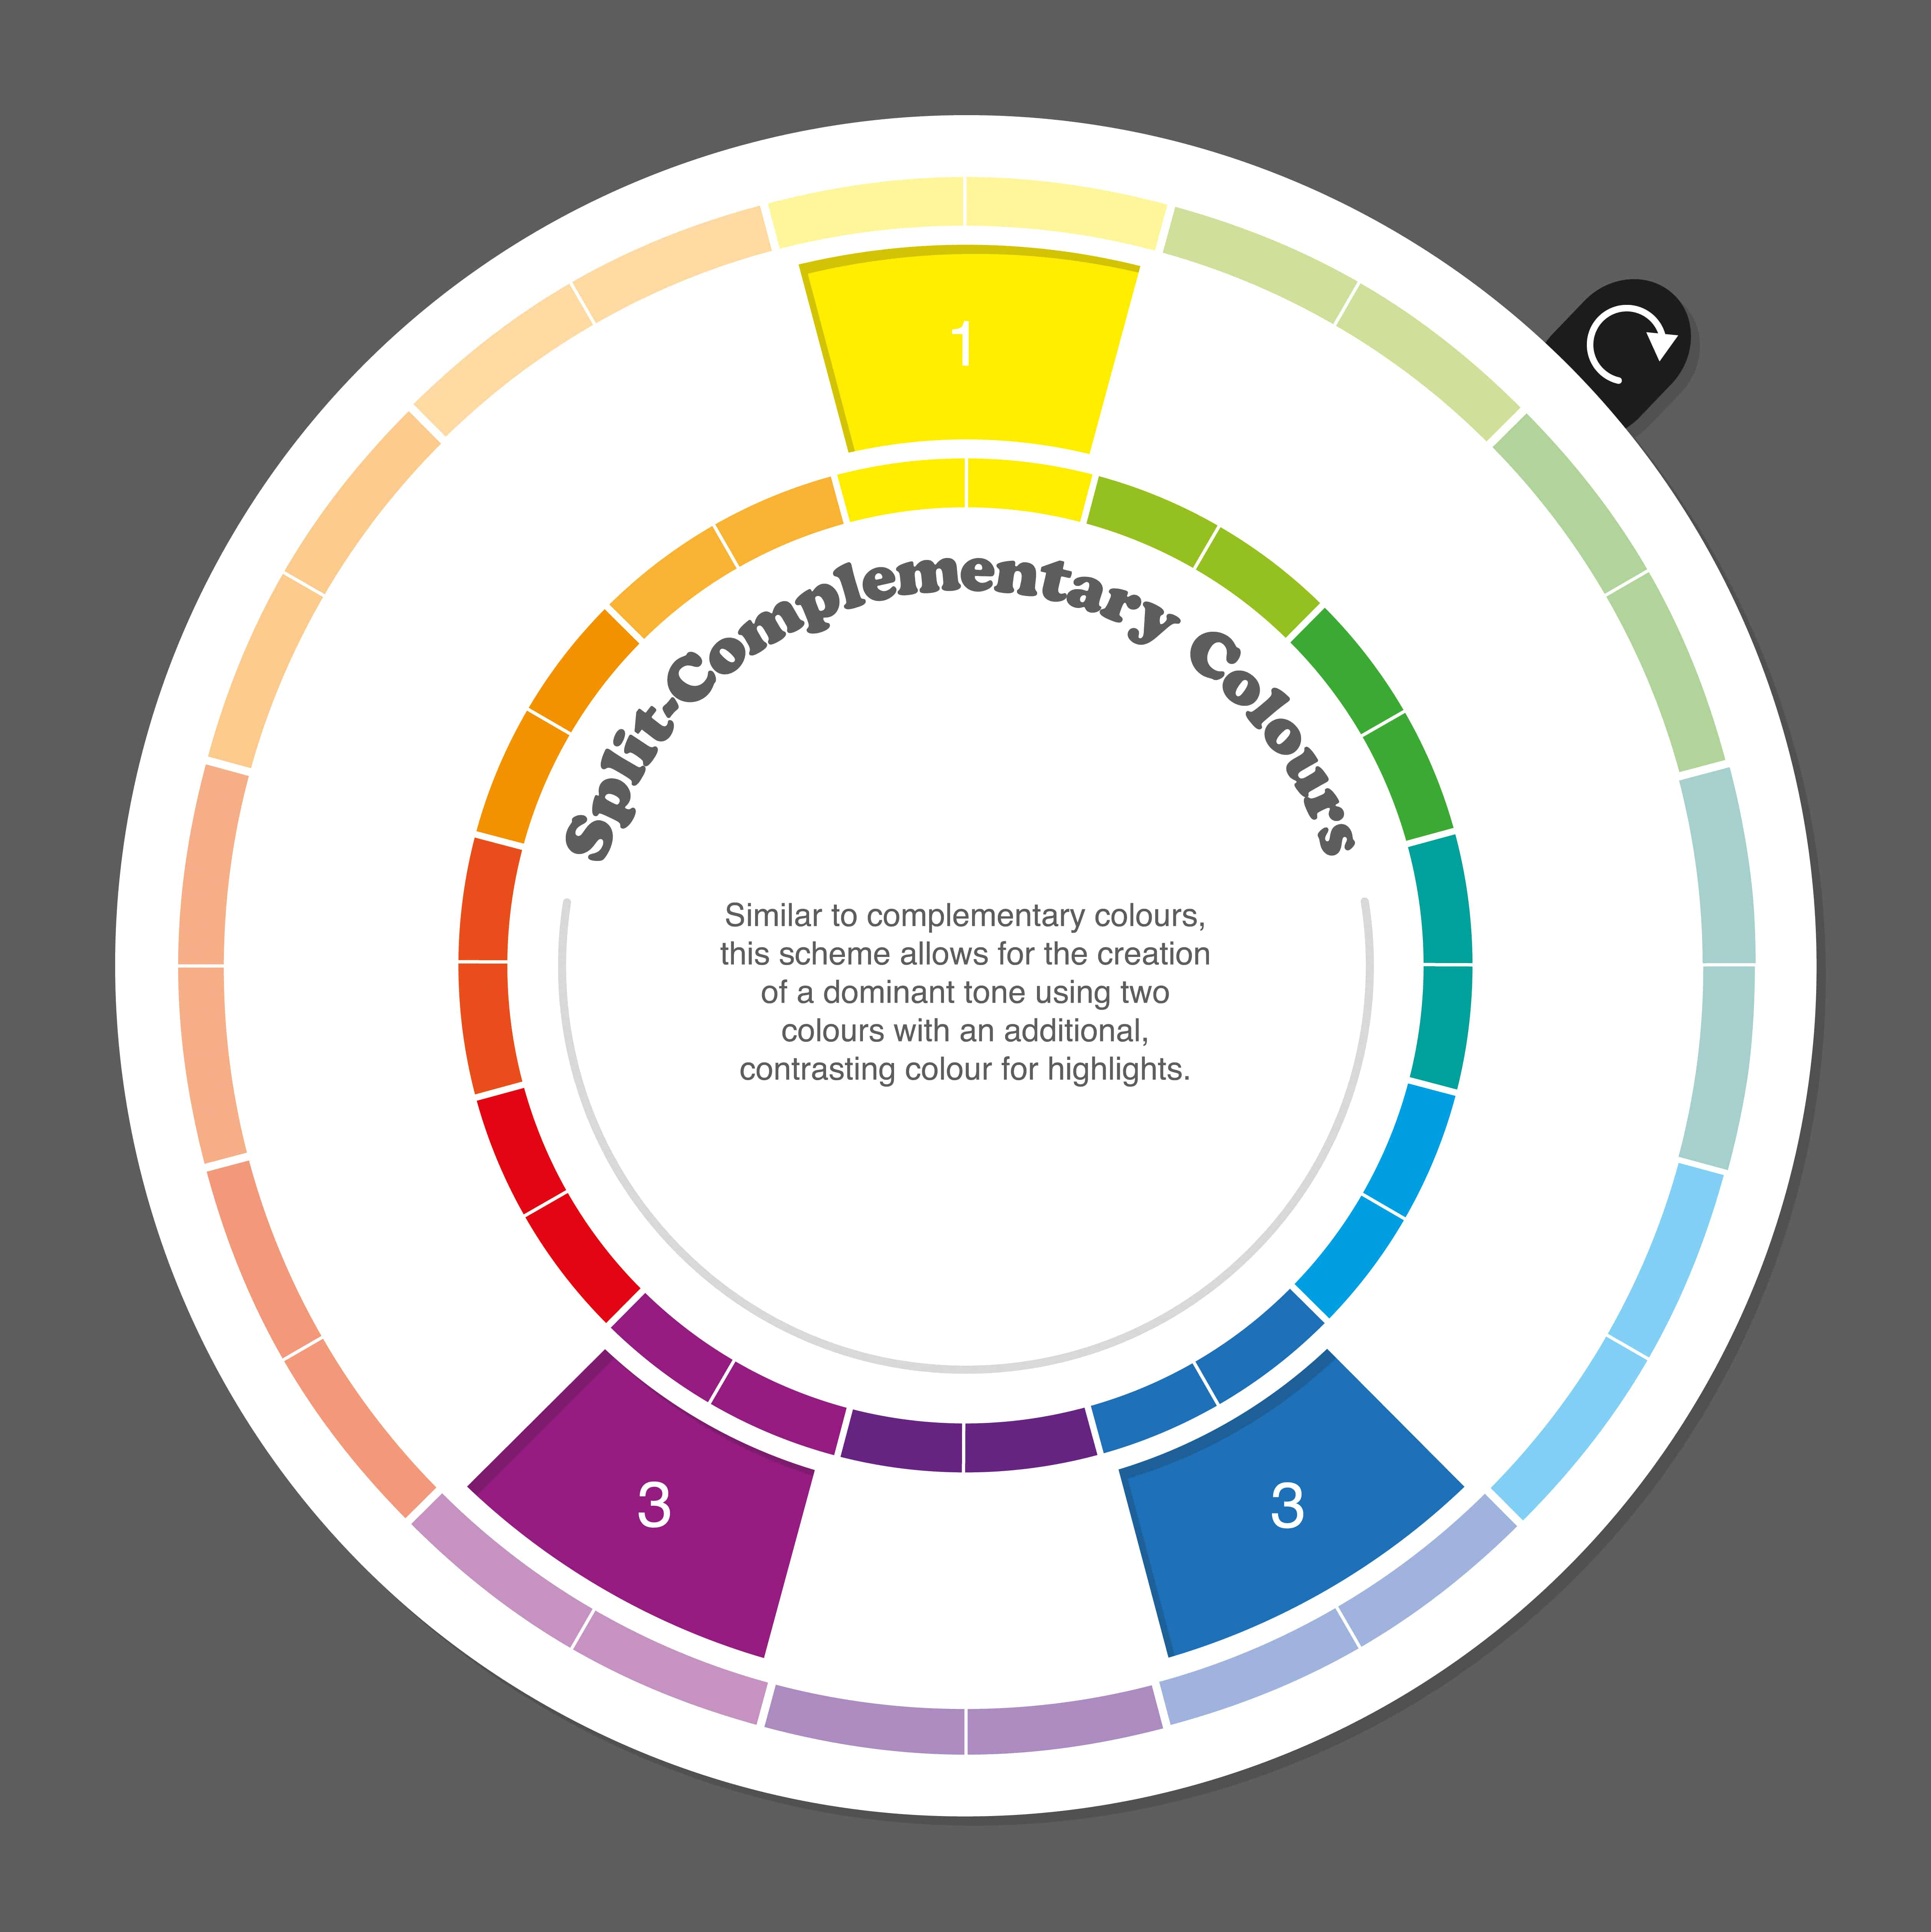 split complementary color scheme shown on a color wheel